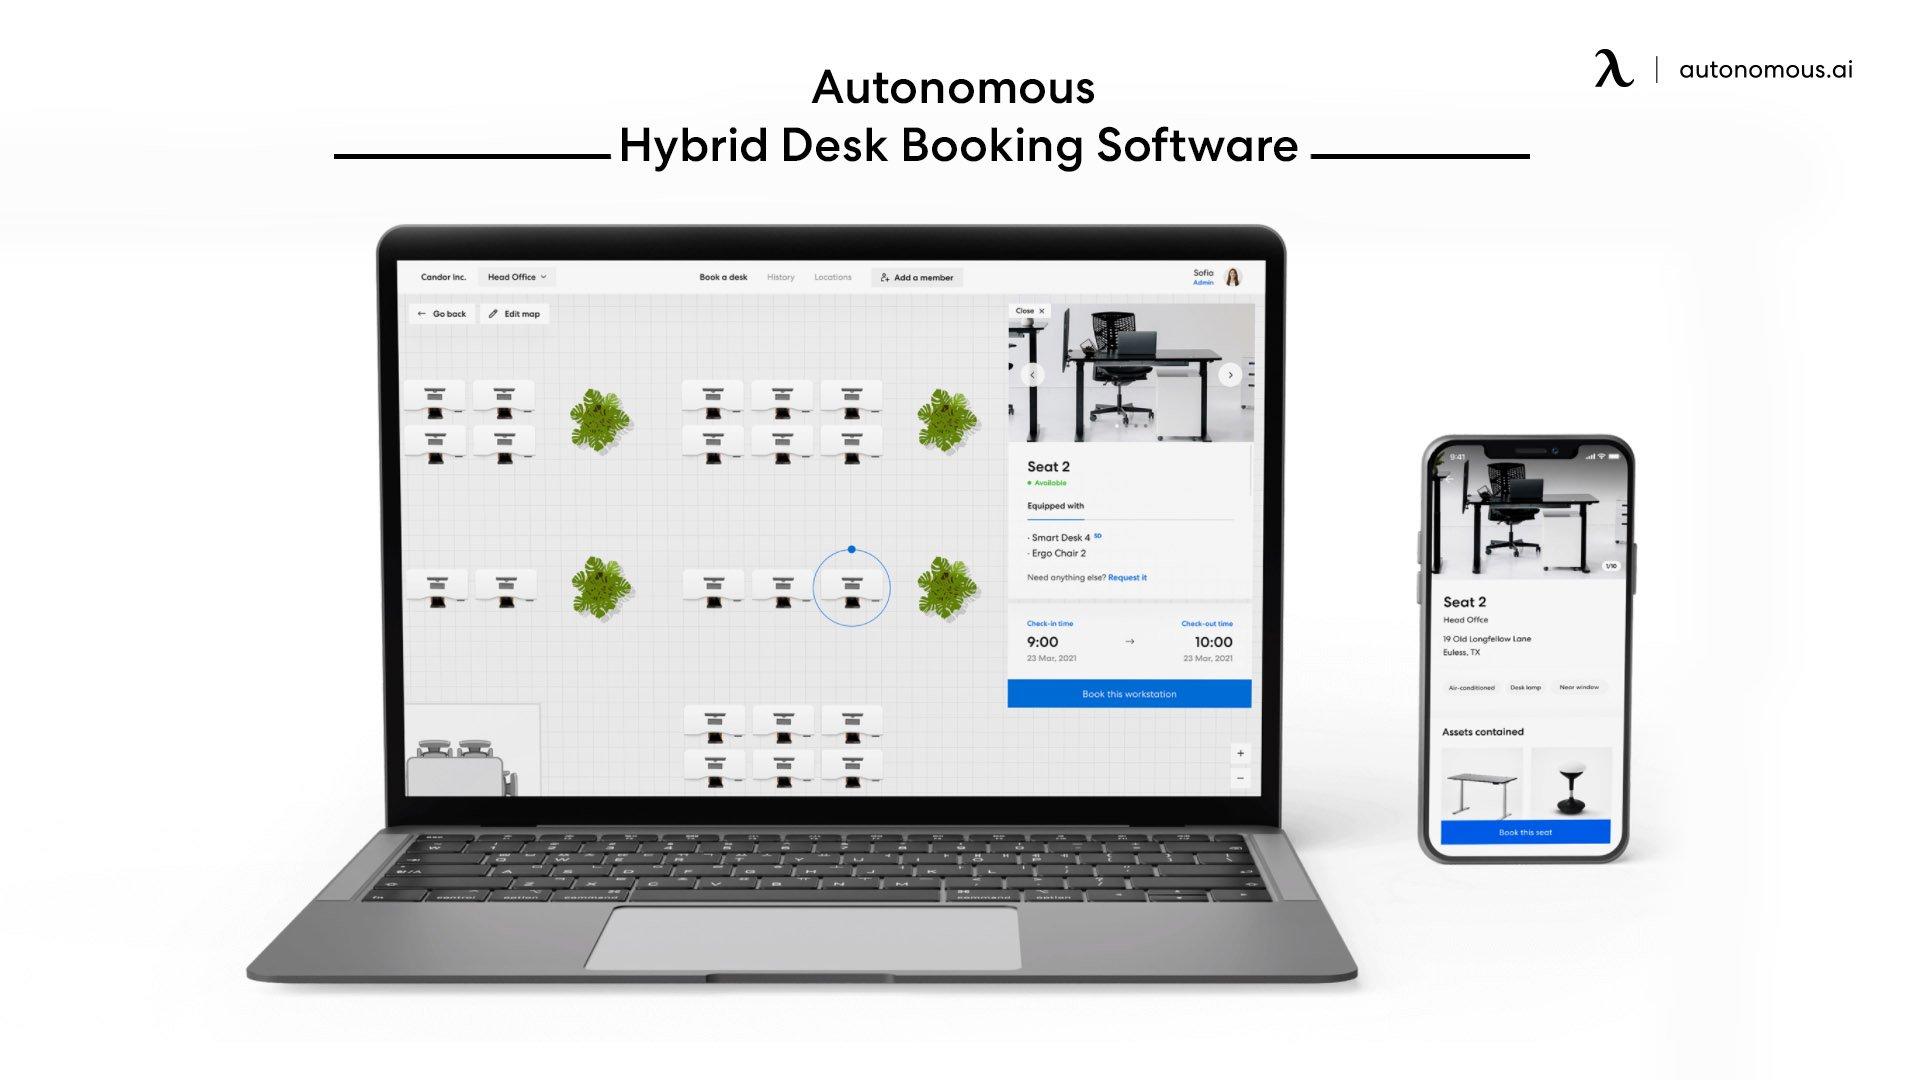 How the Autonomous Hybrid